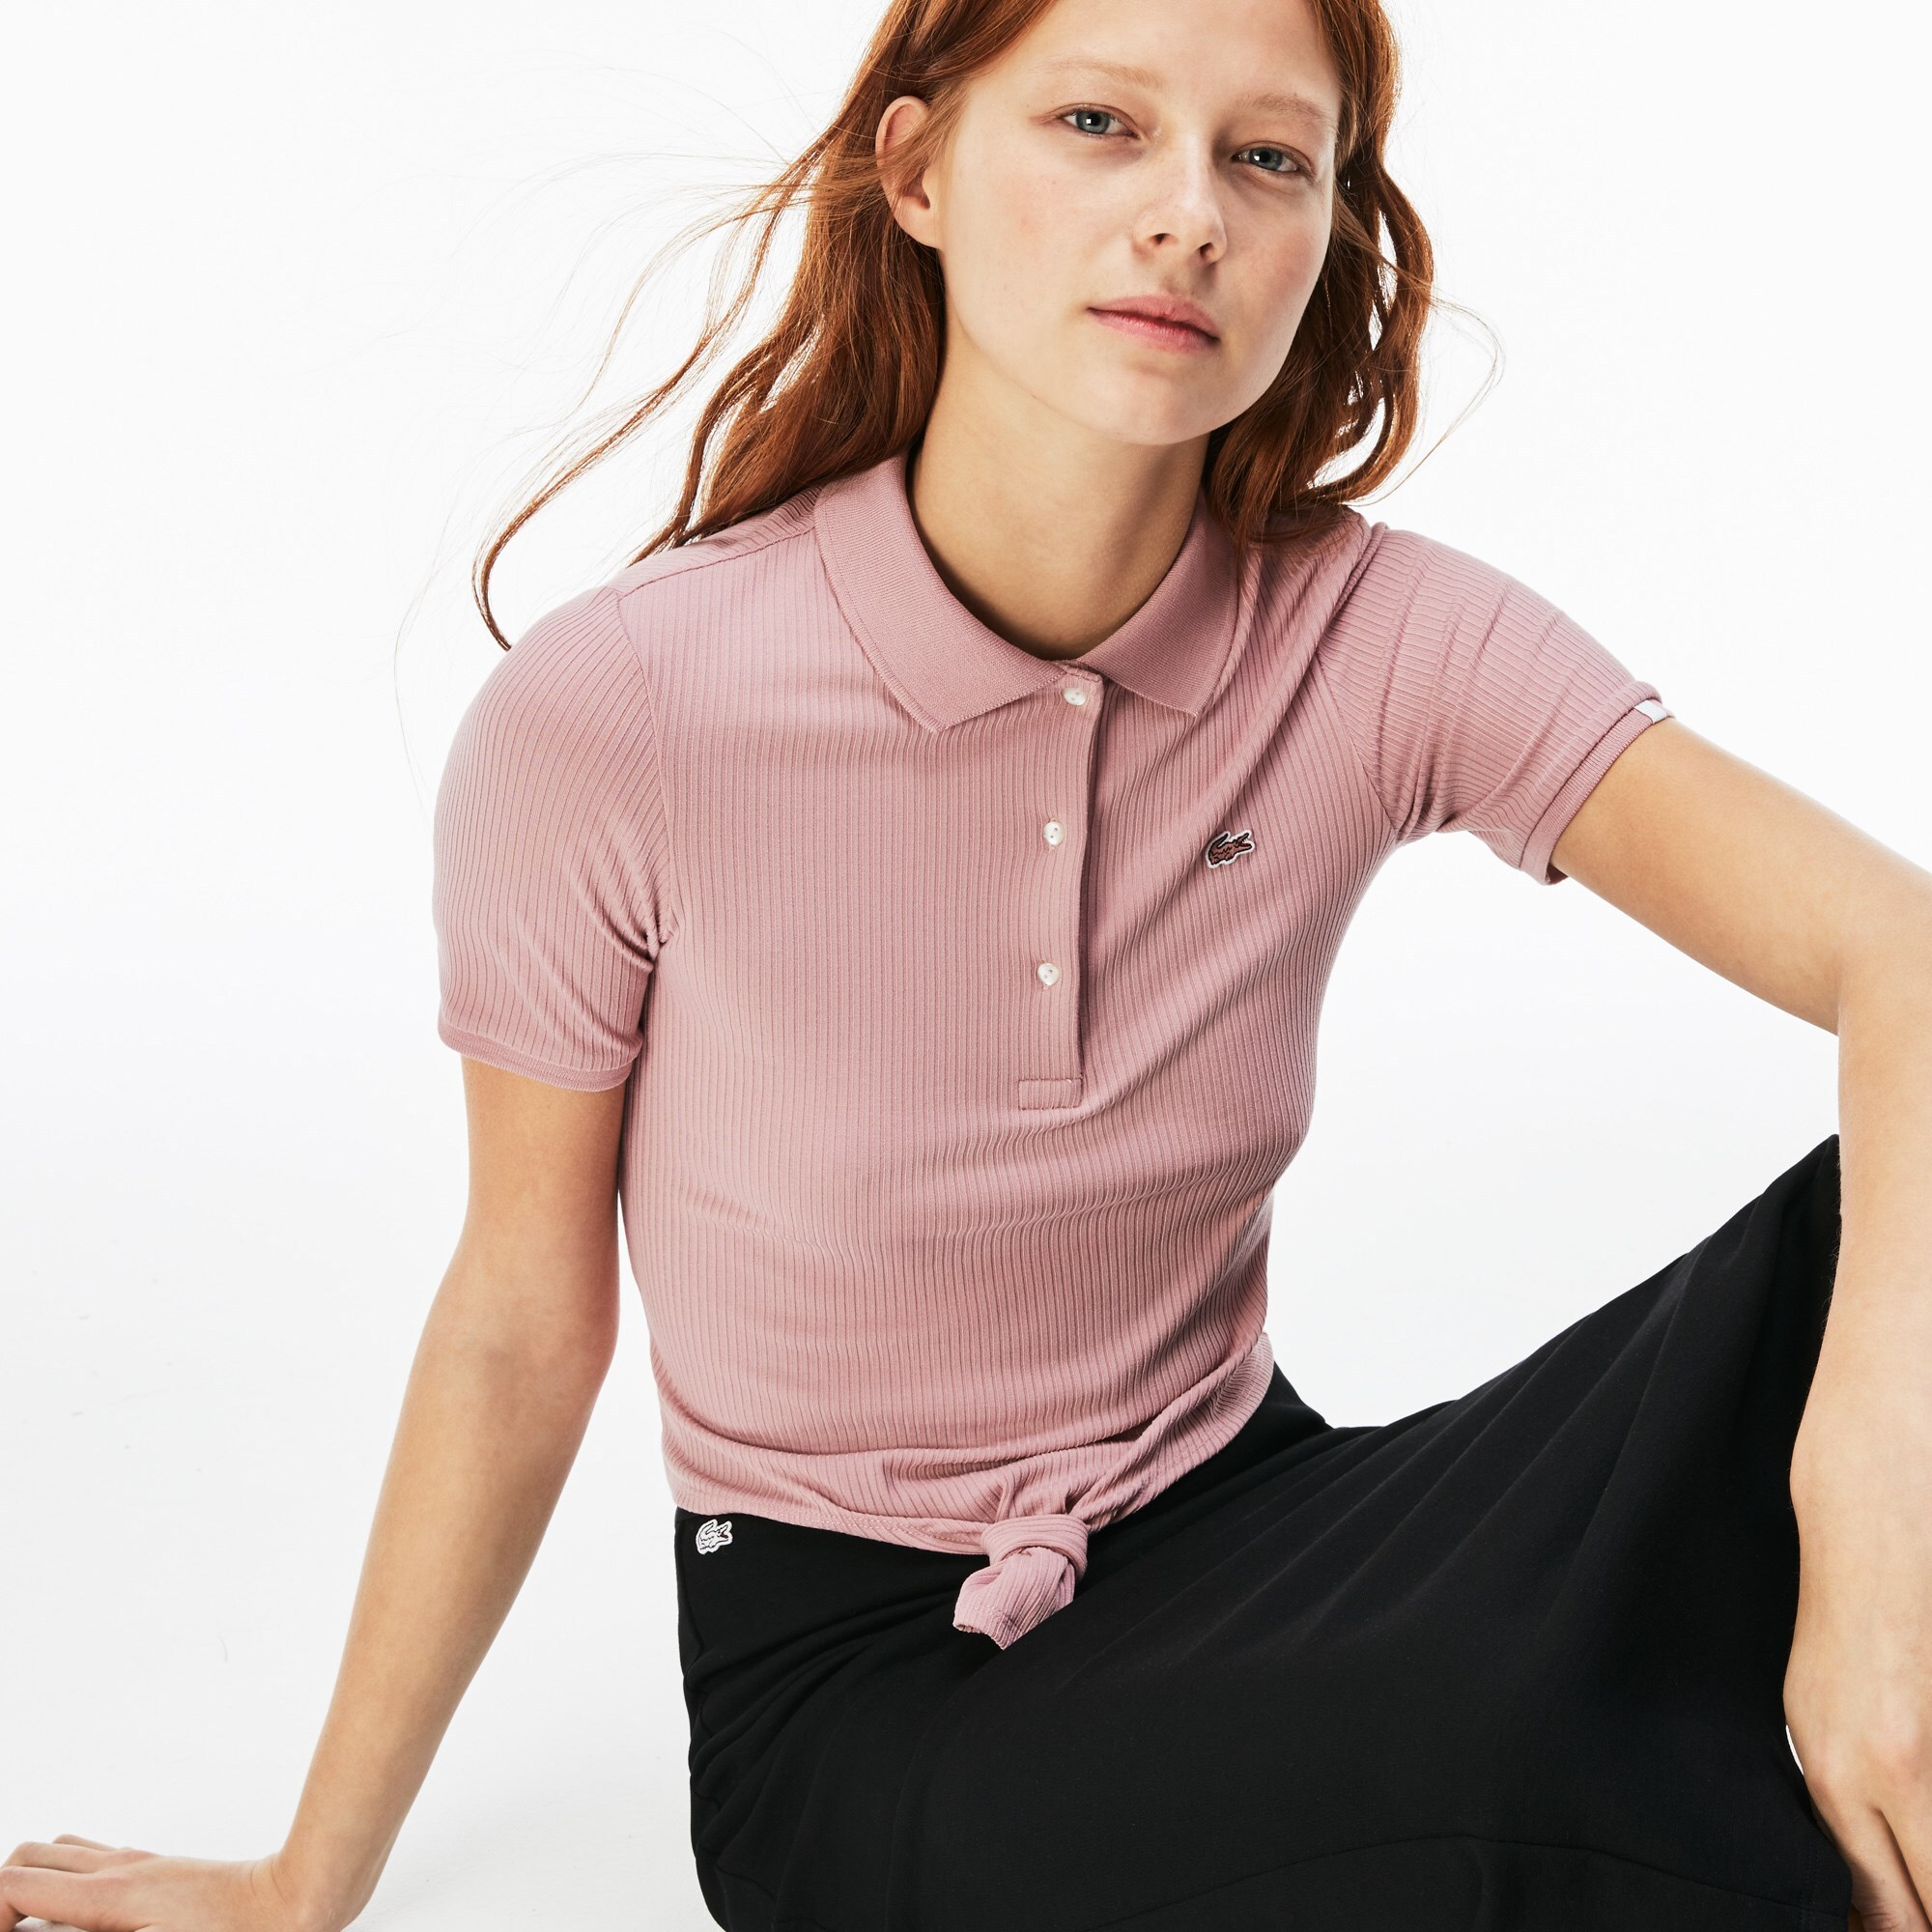 Damen LACOSTE LIVE Stretch-Slim Fit Poloshirt